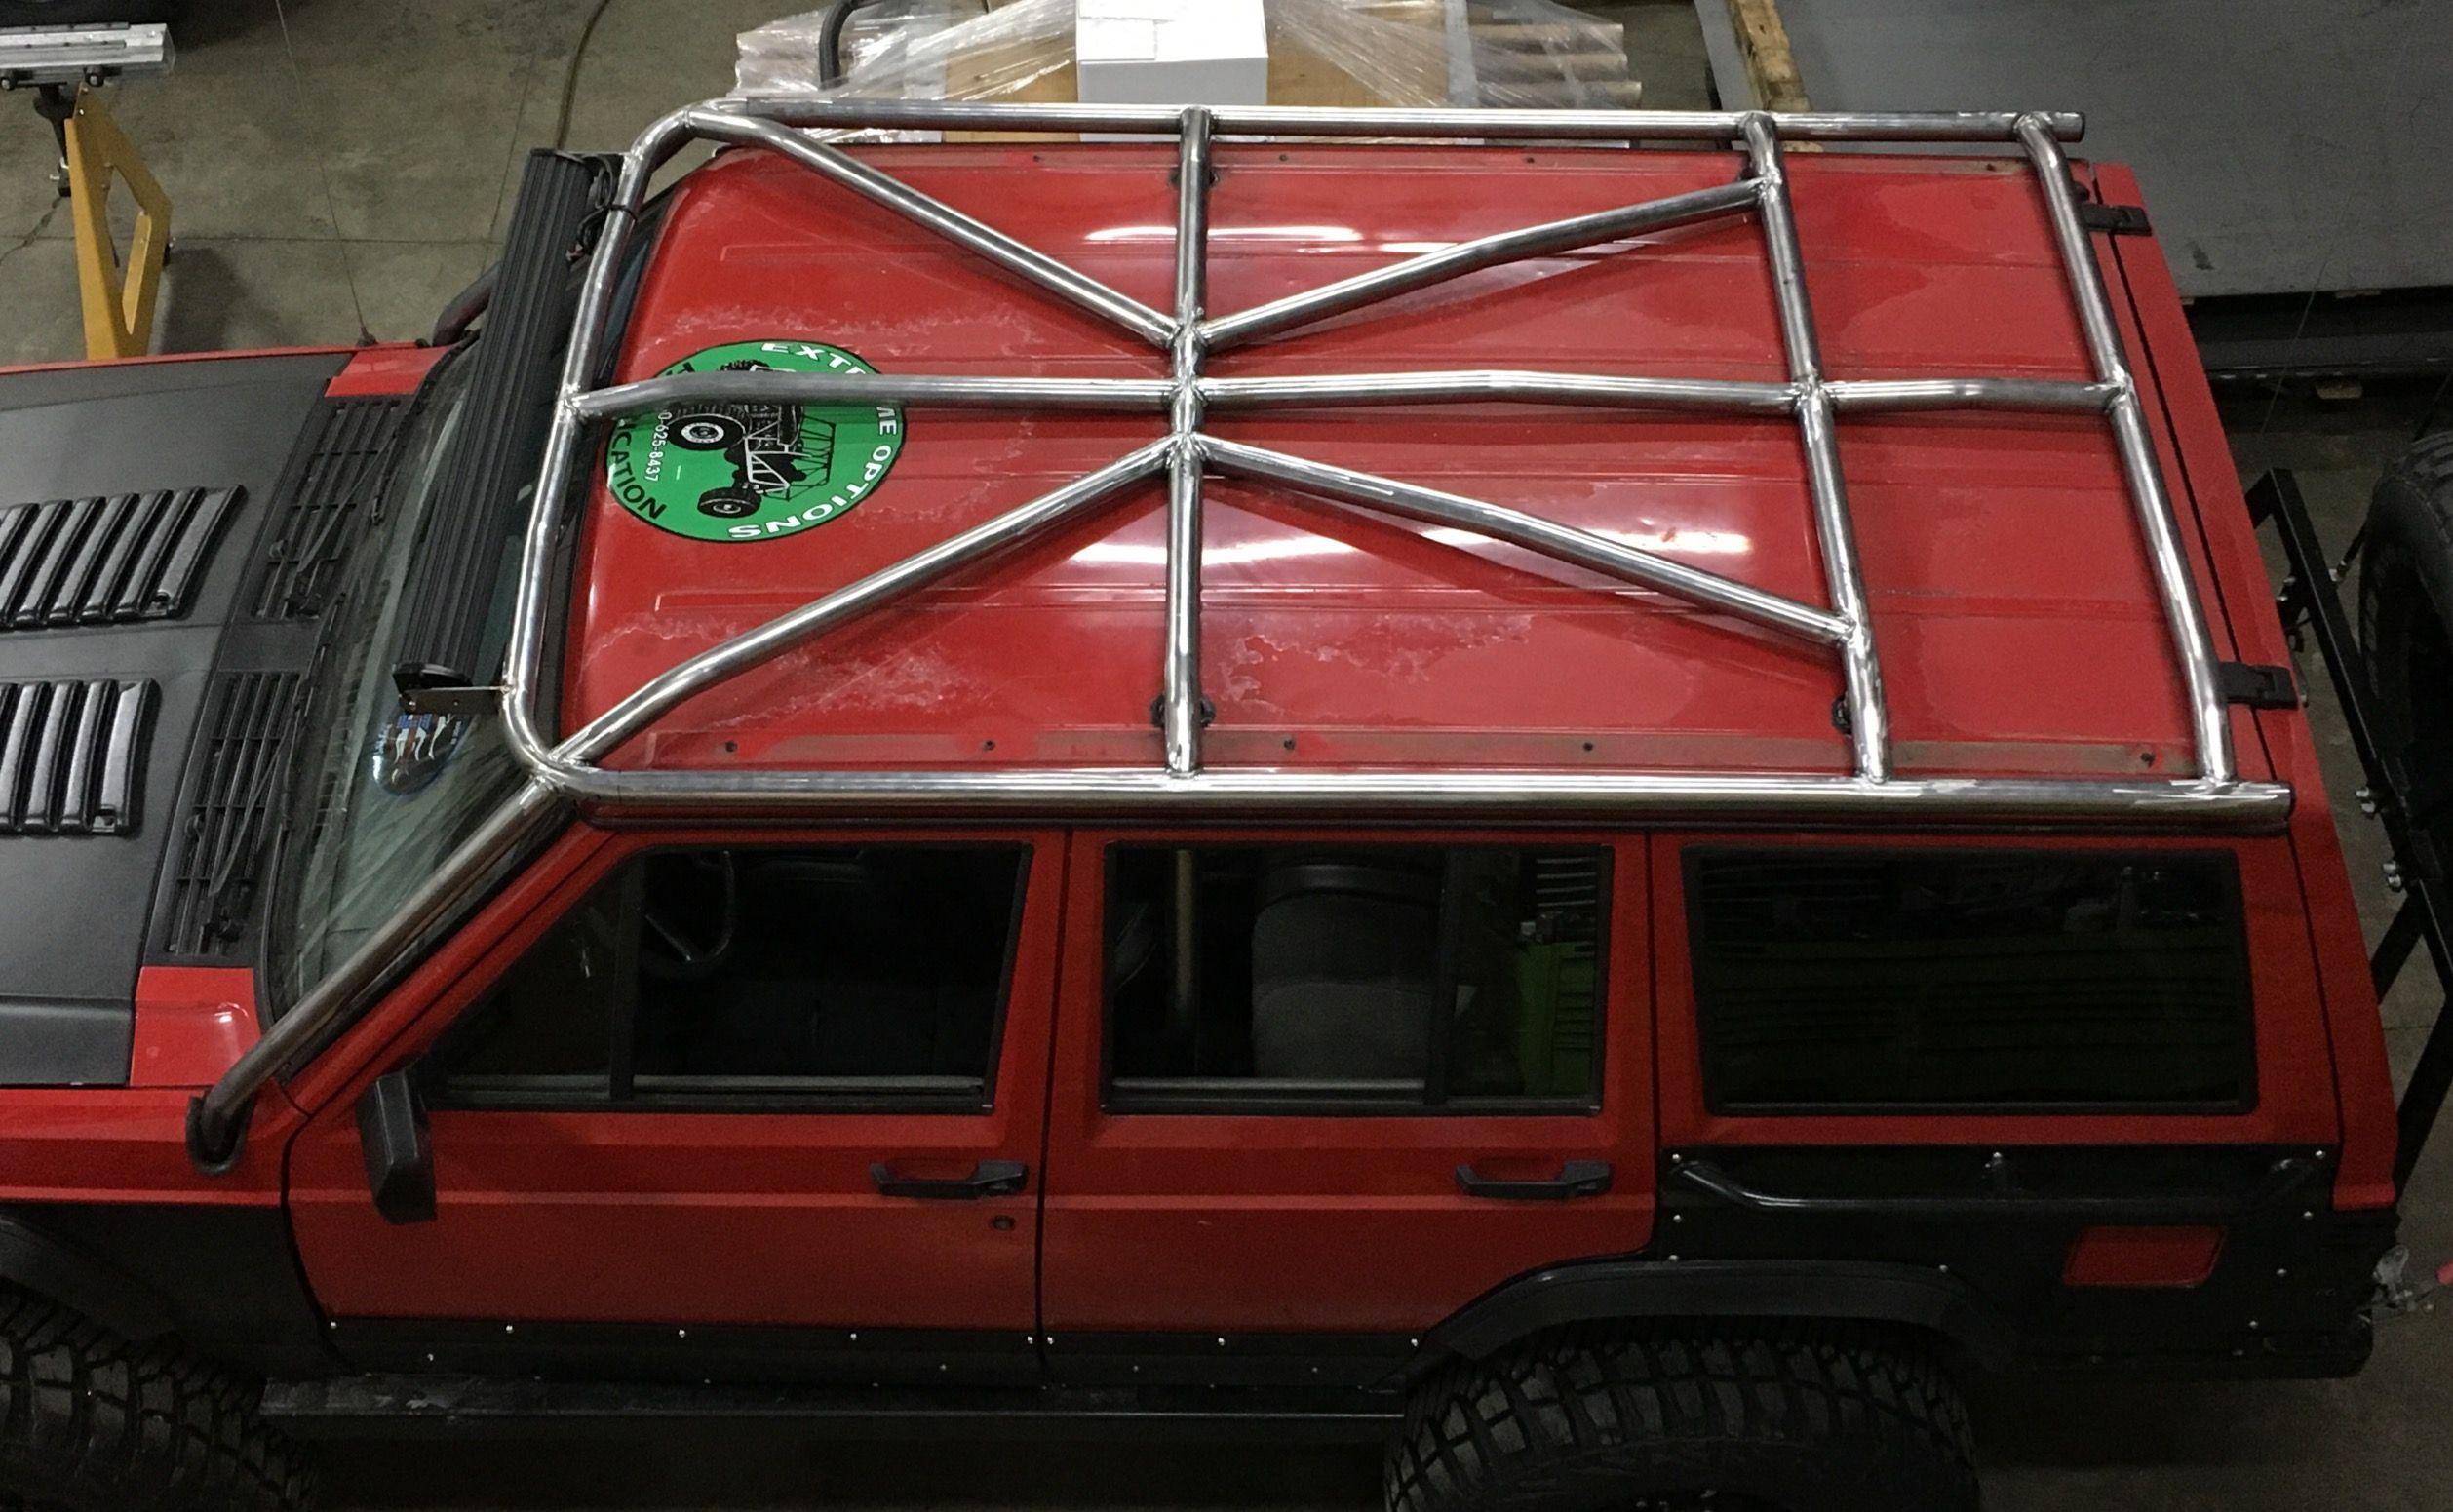 Xj Hybrid Diy Cage Kit Jeep Cherokee Xj Jeep Xj Cage